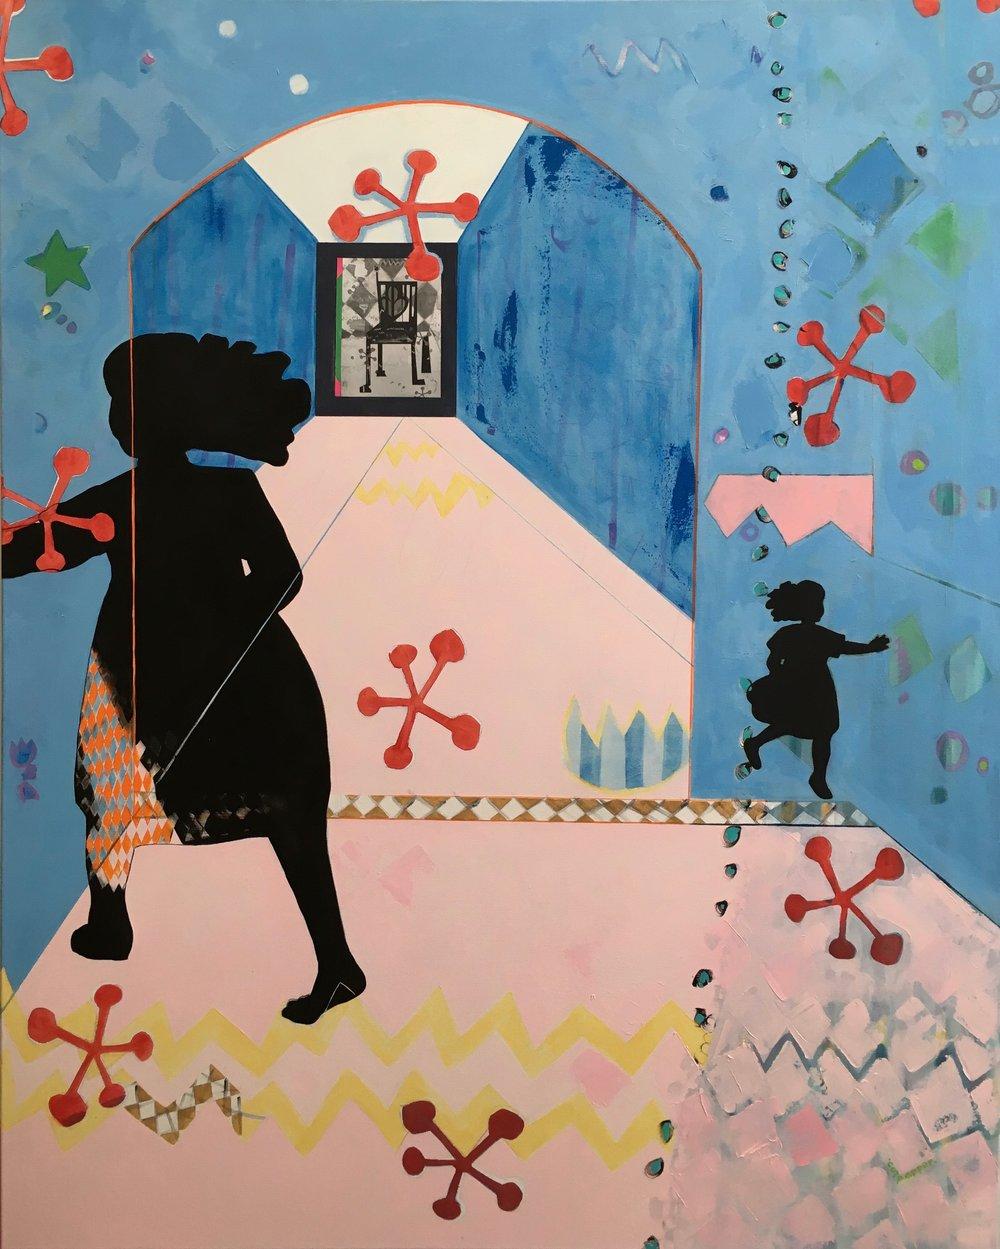 jacks    oil + pencil on canvas  |  60 x 48